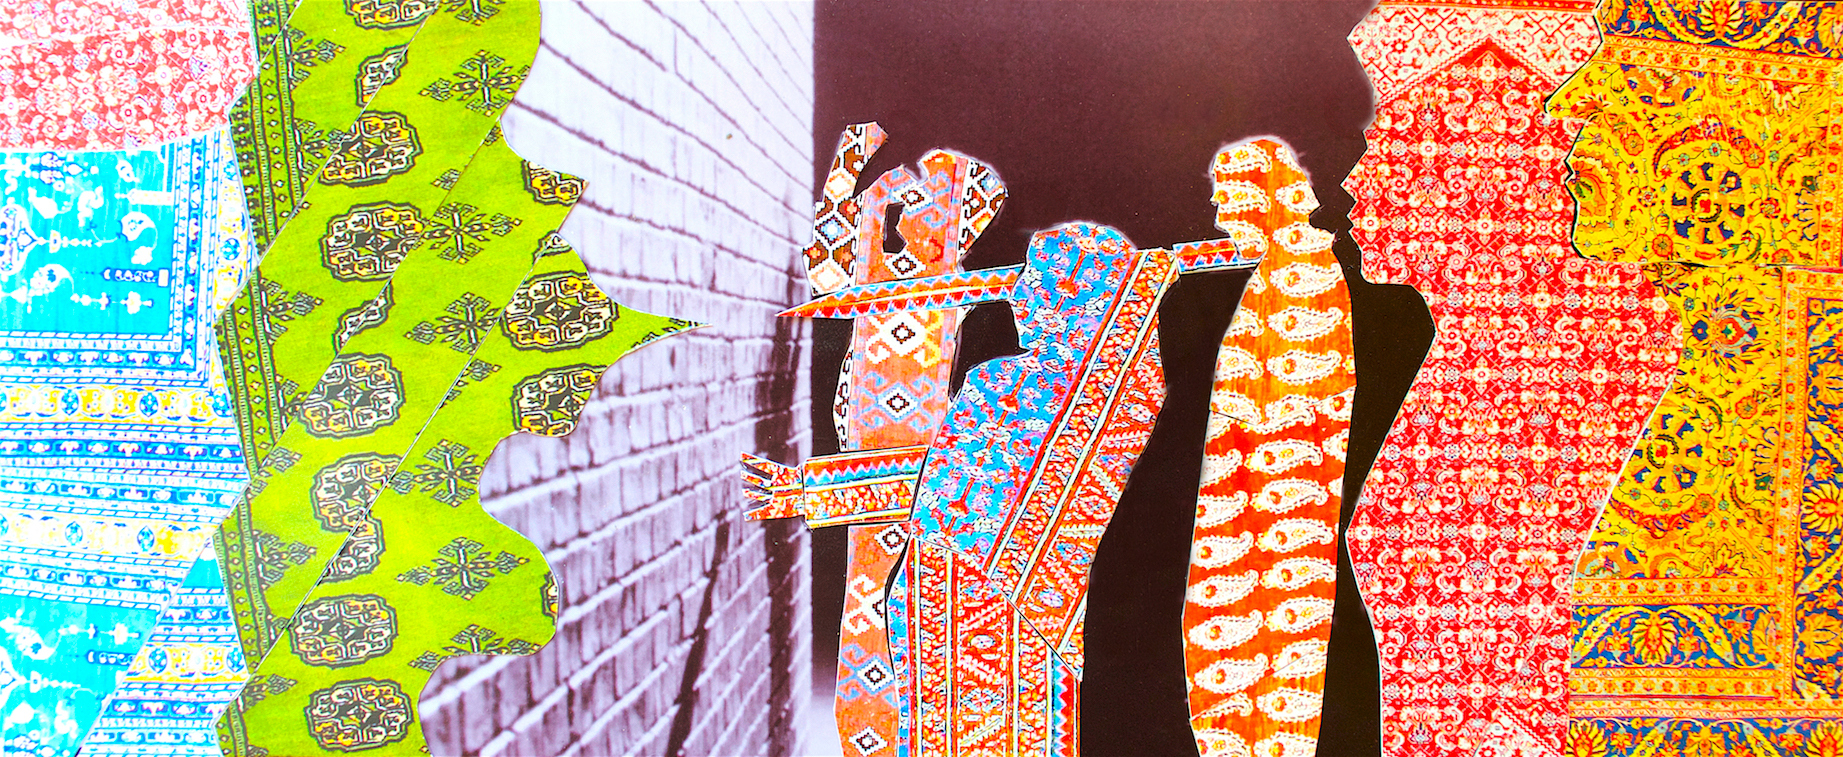 sassan-behnam-bakhtiar-blank-walls-series-blank-walls-01-chromogenic-print-mounted-on-dibond2016